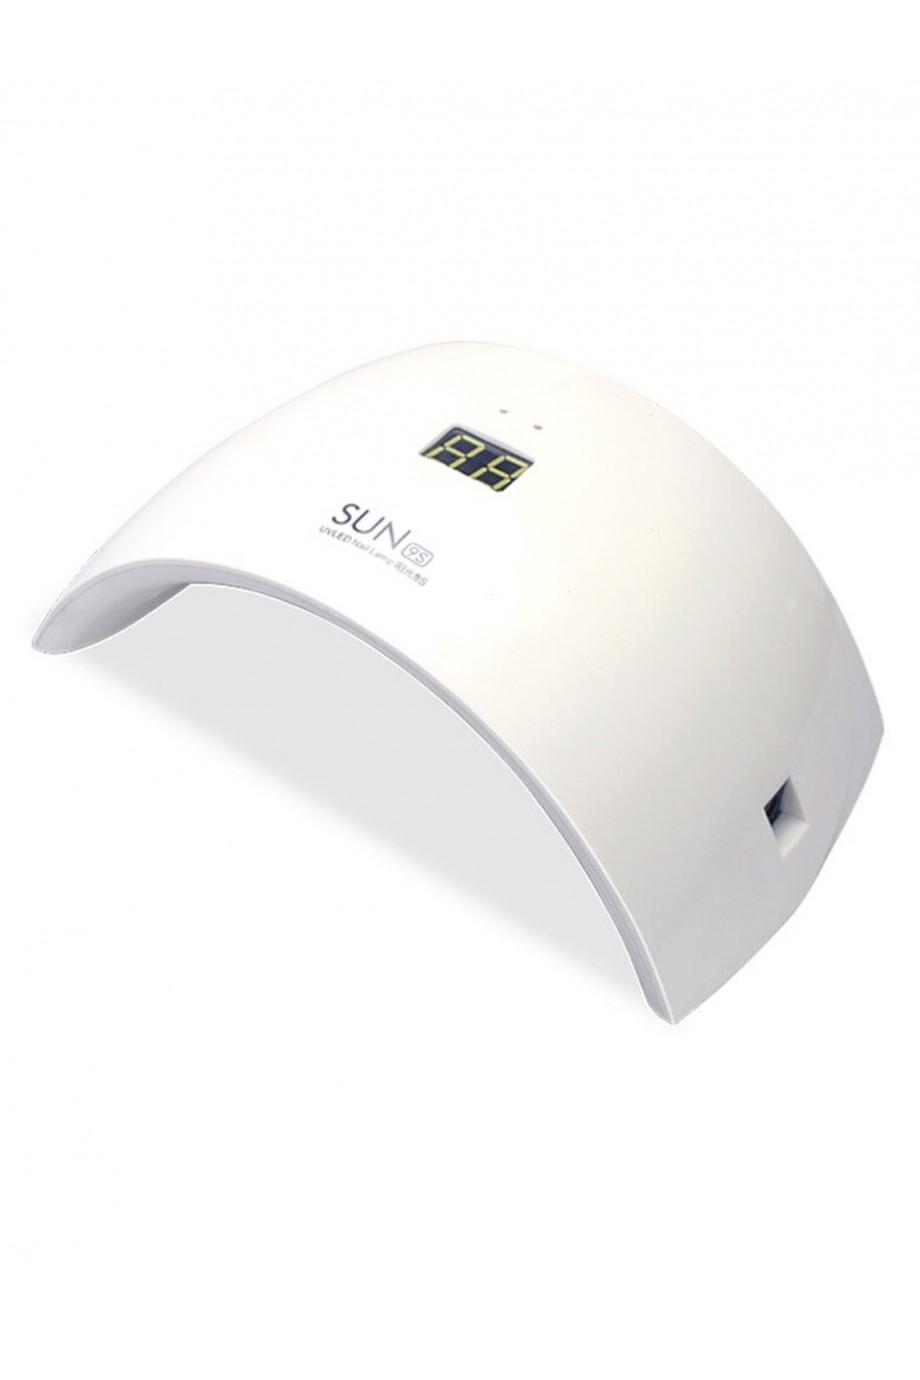 Лампа для сушки лака Sun 9S, LED, 24 Вт, белый